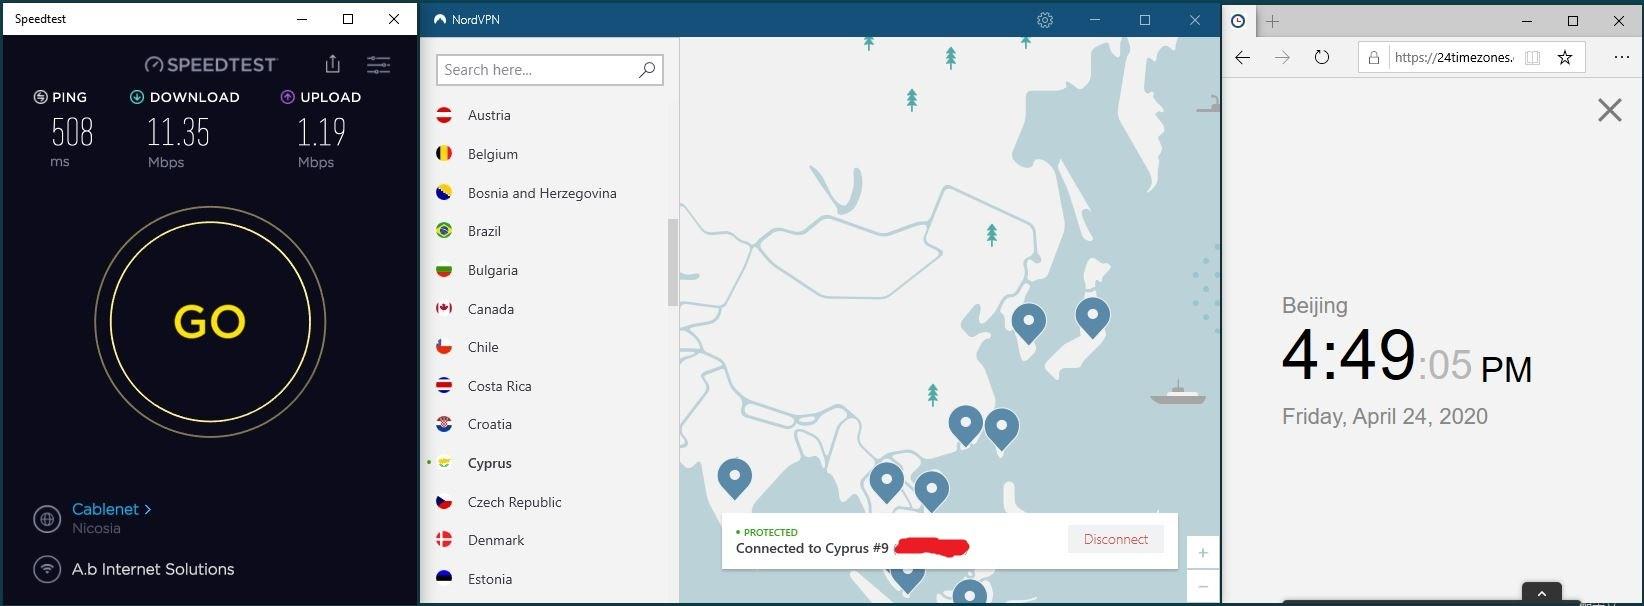 Windows10 NordVPN Cyprus #9 中国VPN 翻墙 科学上网 SpeedTest测速-20200424